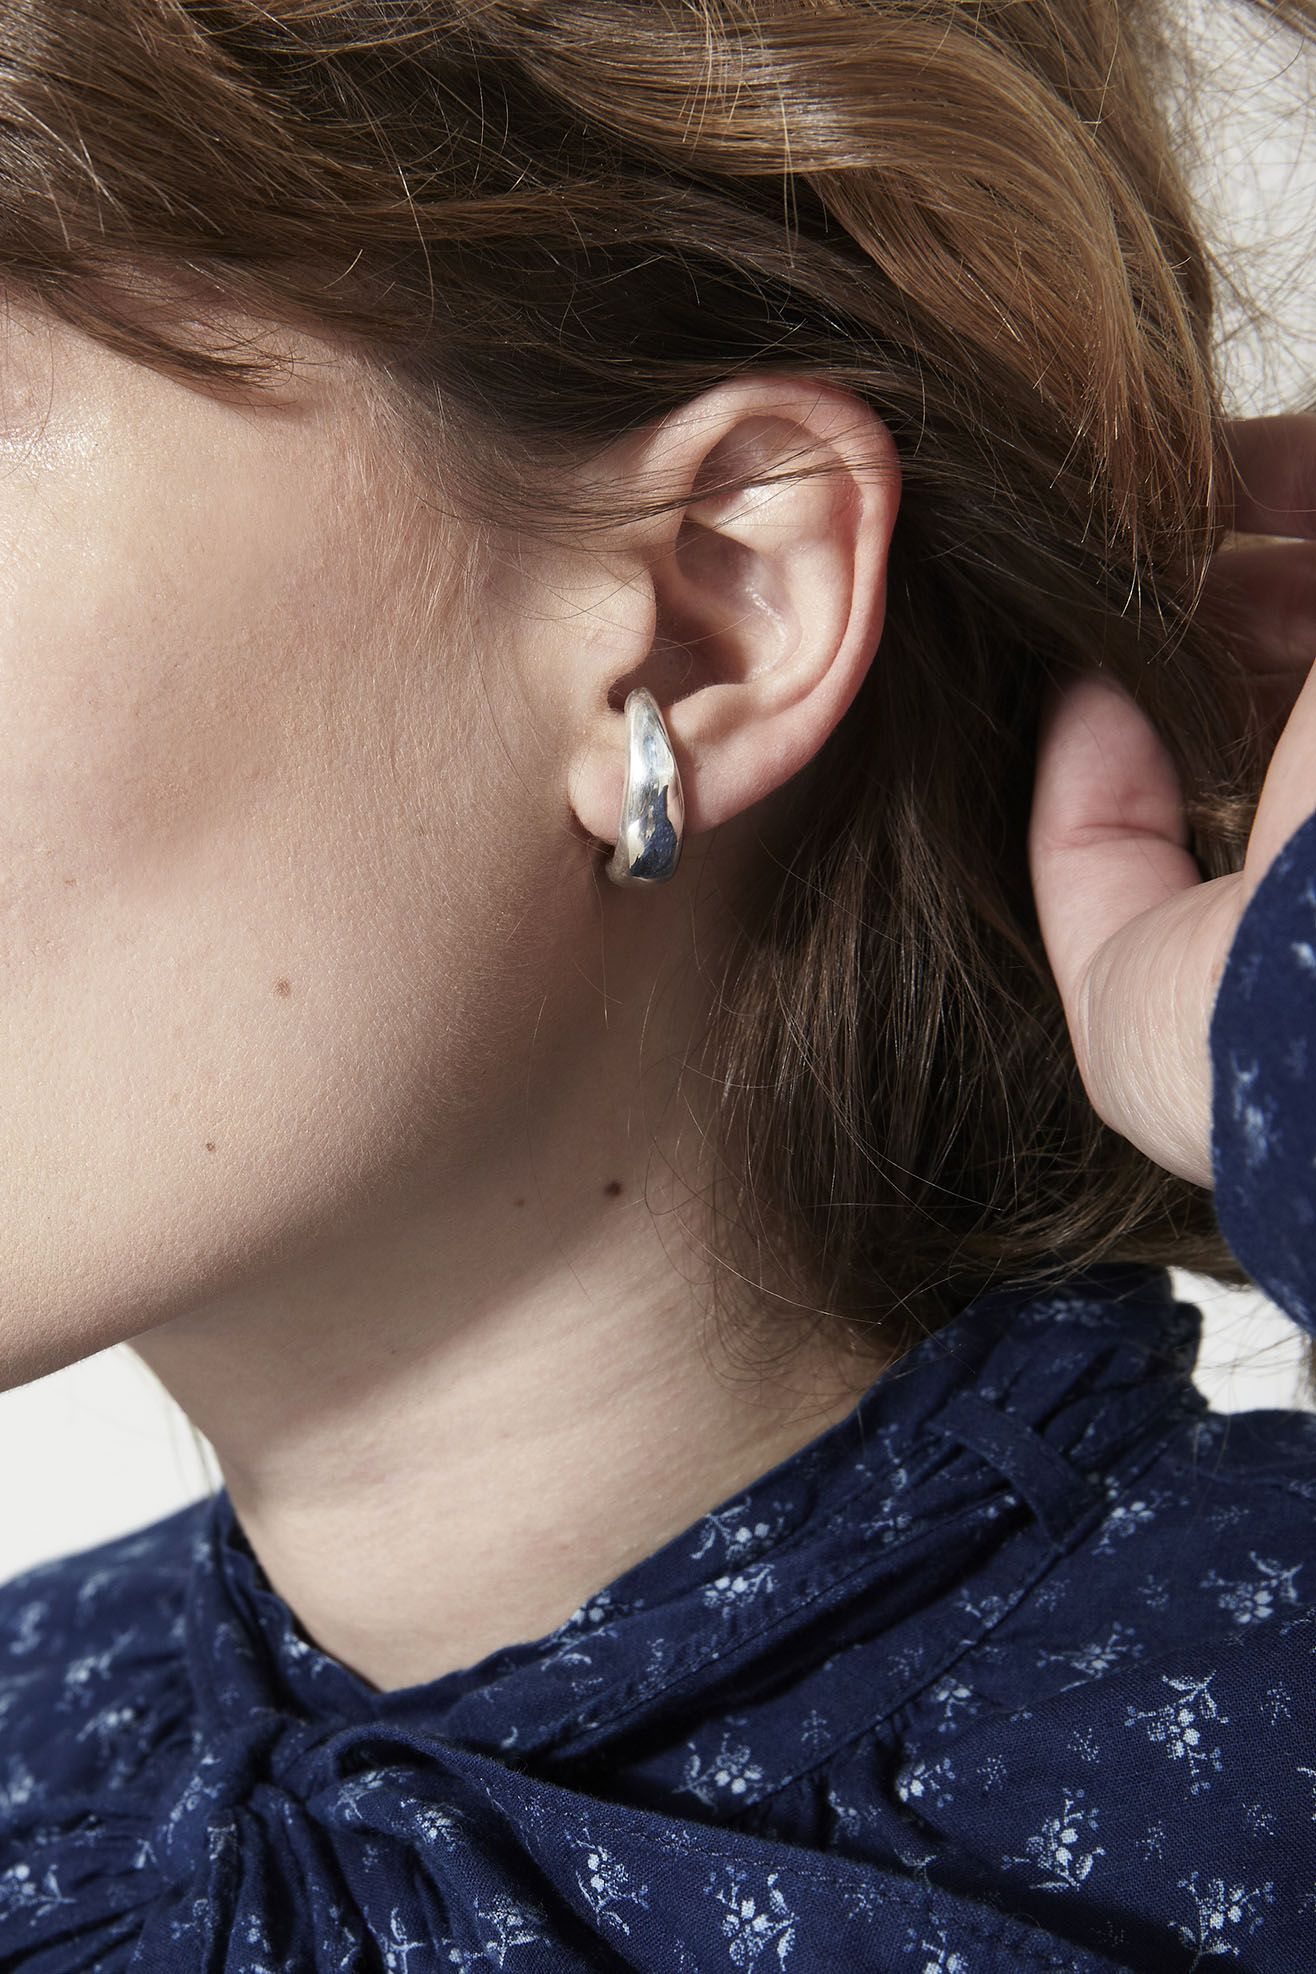 7a319dc7811fb SOPHIE BUHAI, Large Lobe Earrings | MR. LARKIN | NEW ARRIVALS ...